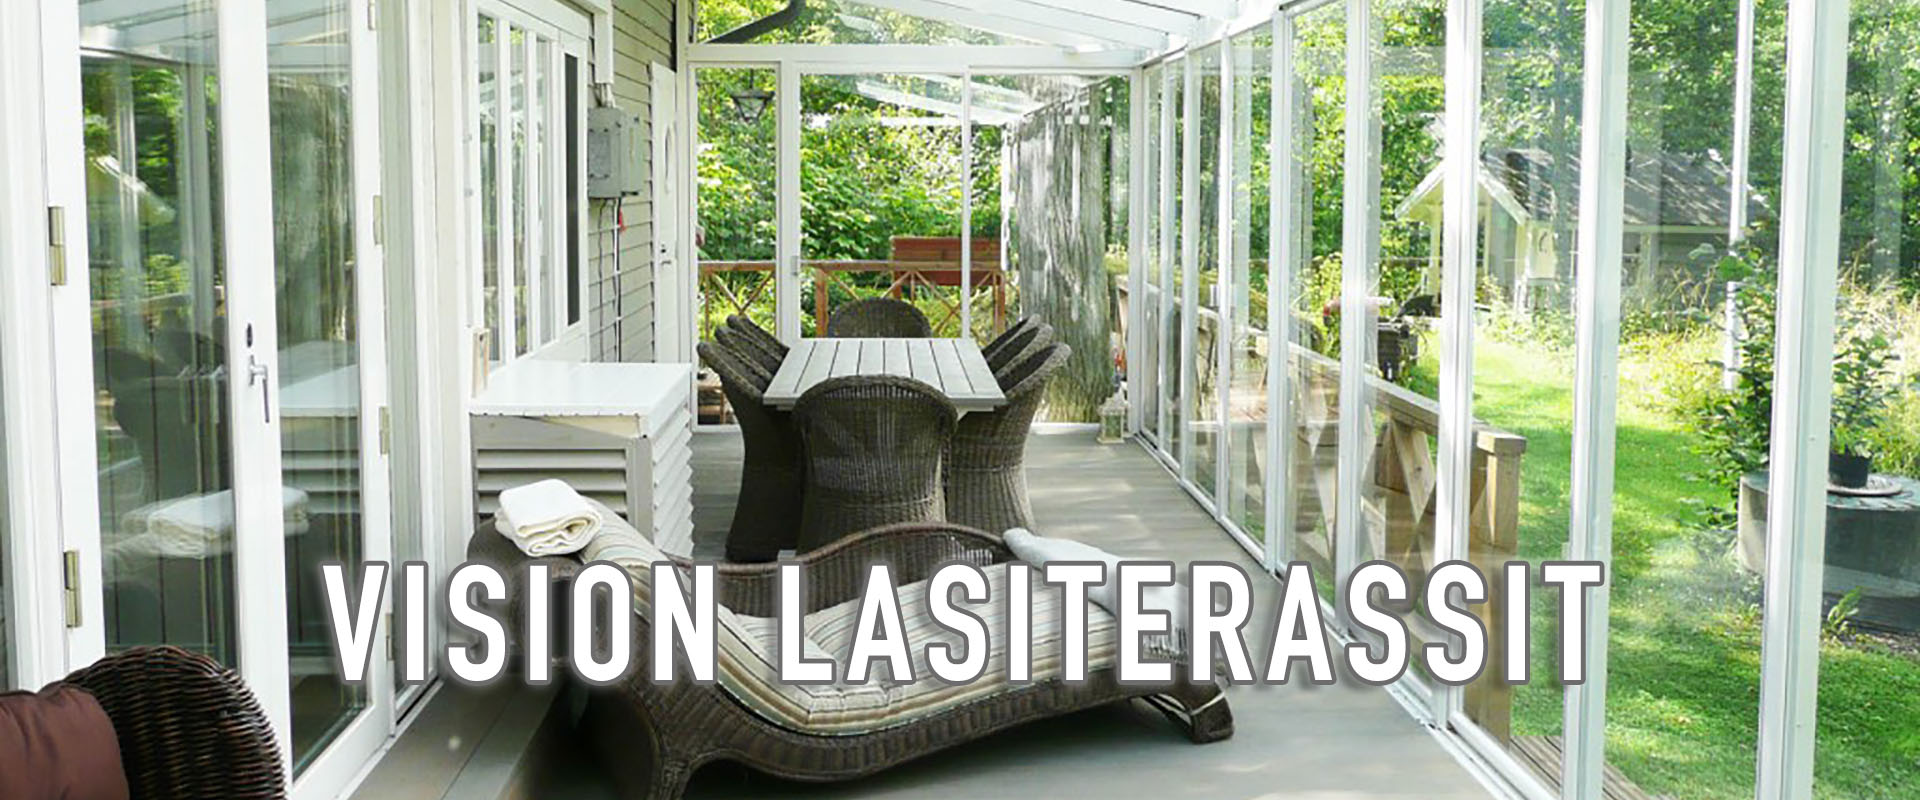 Lasiterassi Tampere - Vision Lasiterassit ja parvekelasit